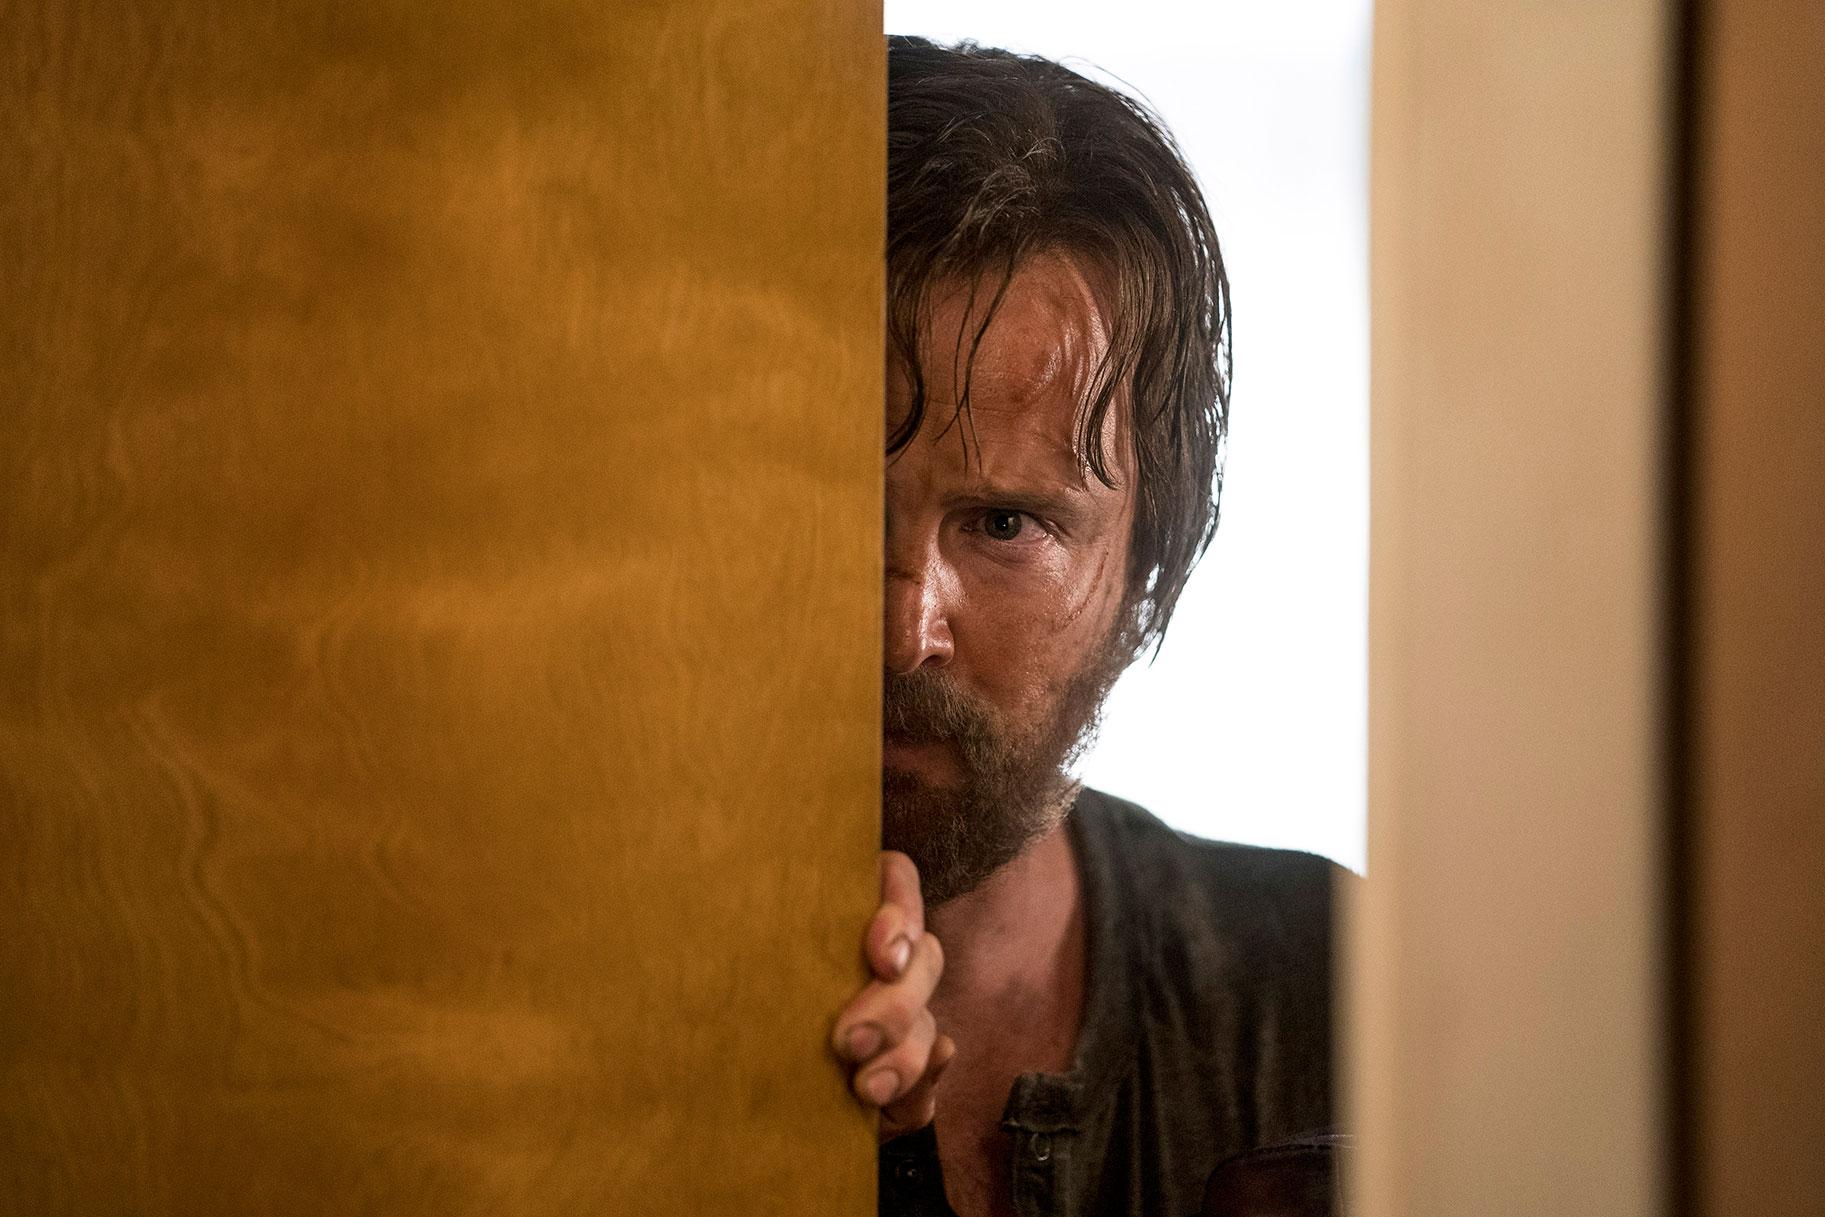 'Han knuste det absolut': Aaron Paul lover 'Breaking Bad' -filmen vil ikke skade seriens arv